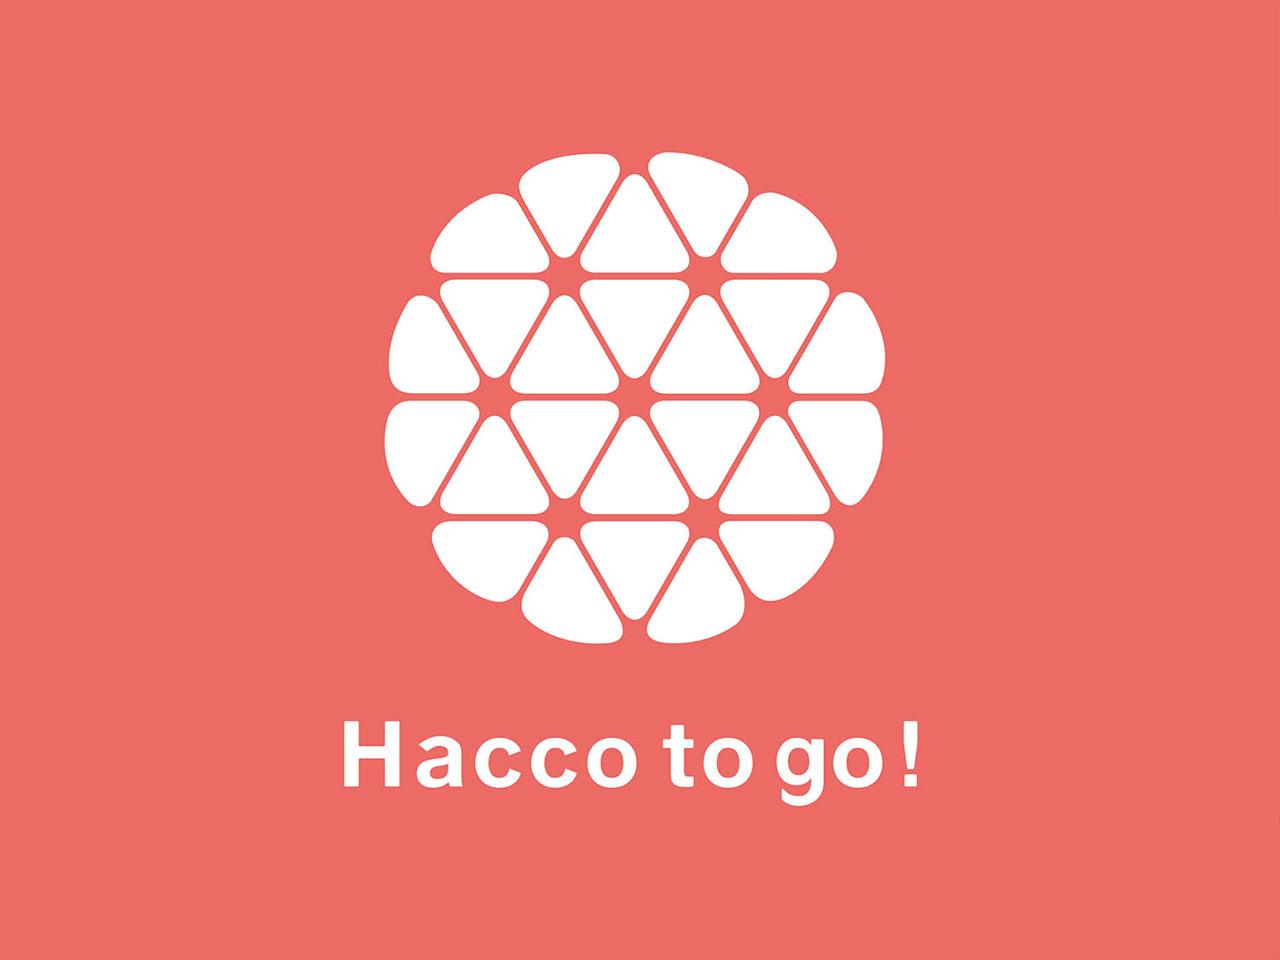 Hacco to go!「JOGURT(醸グルト)」